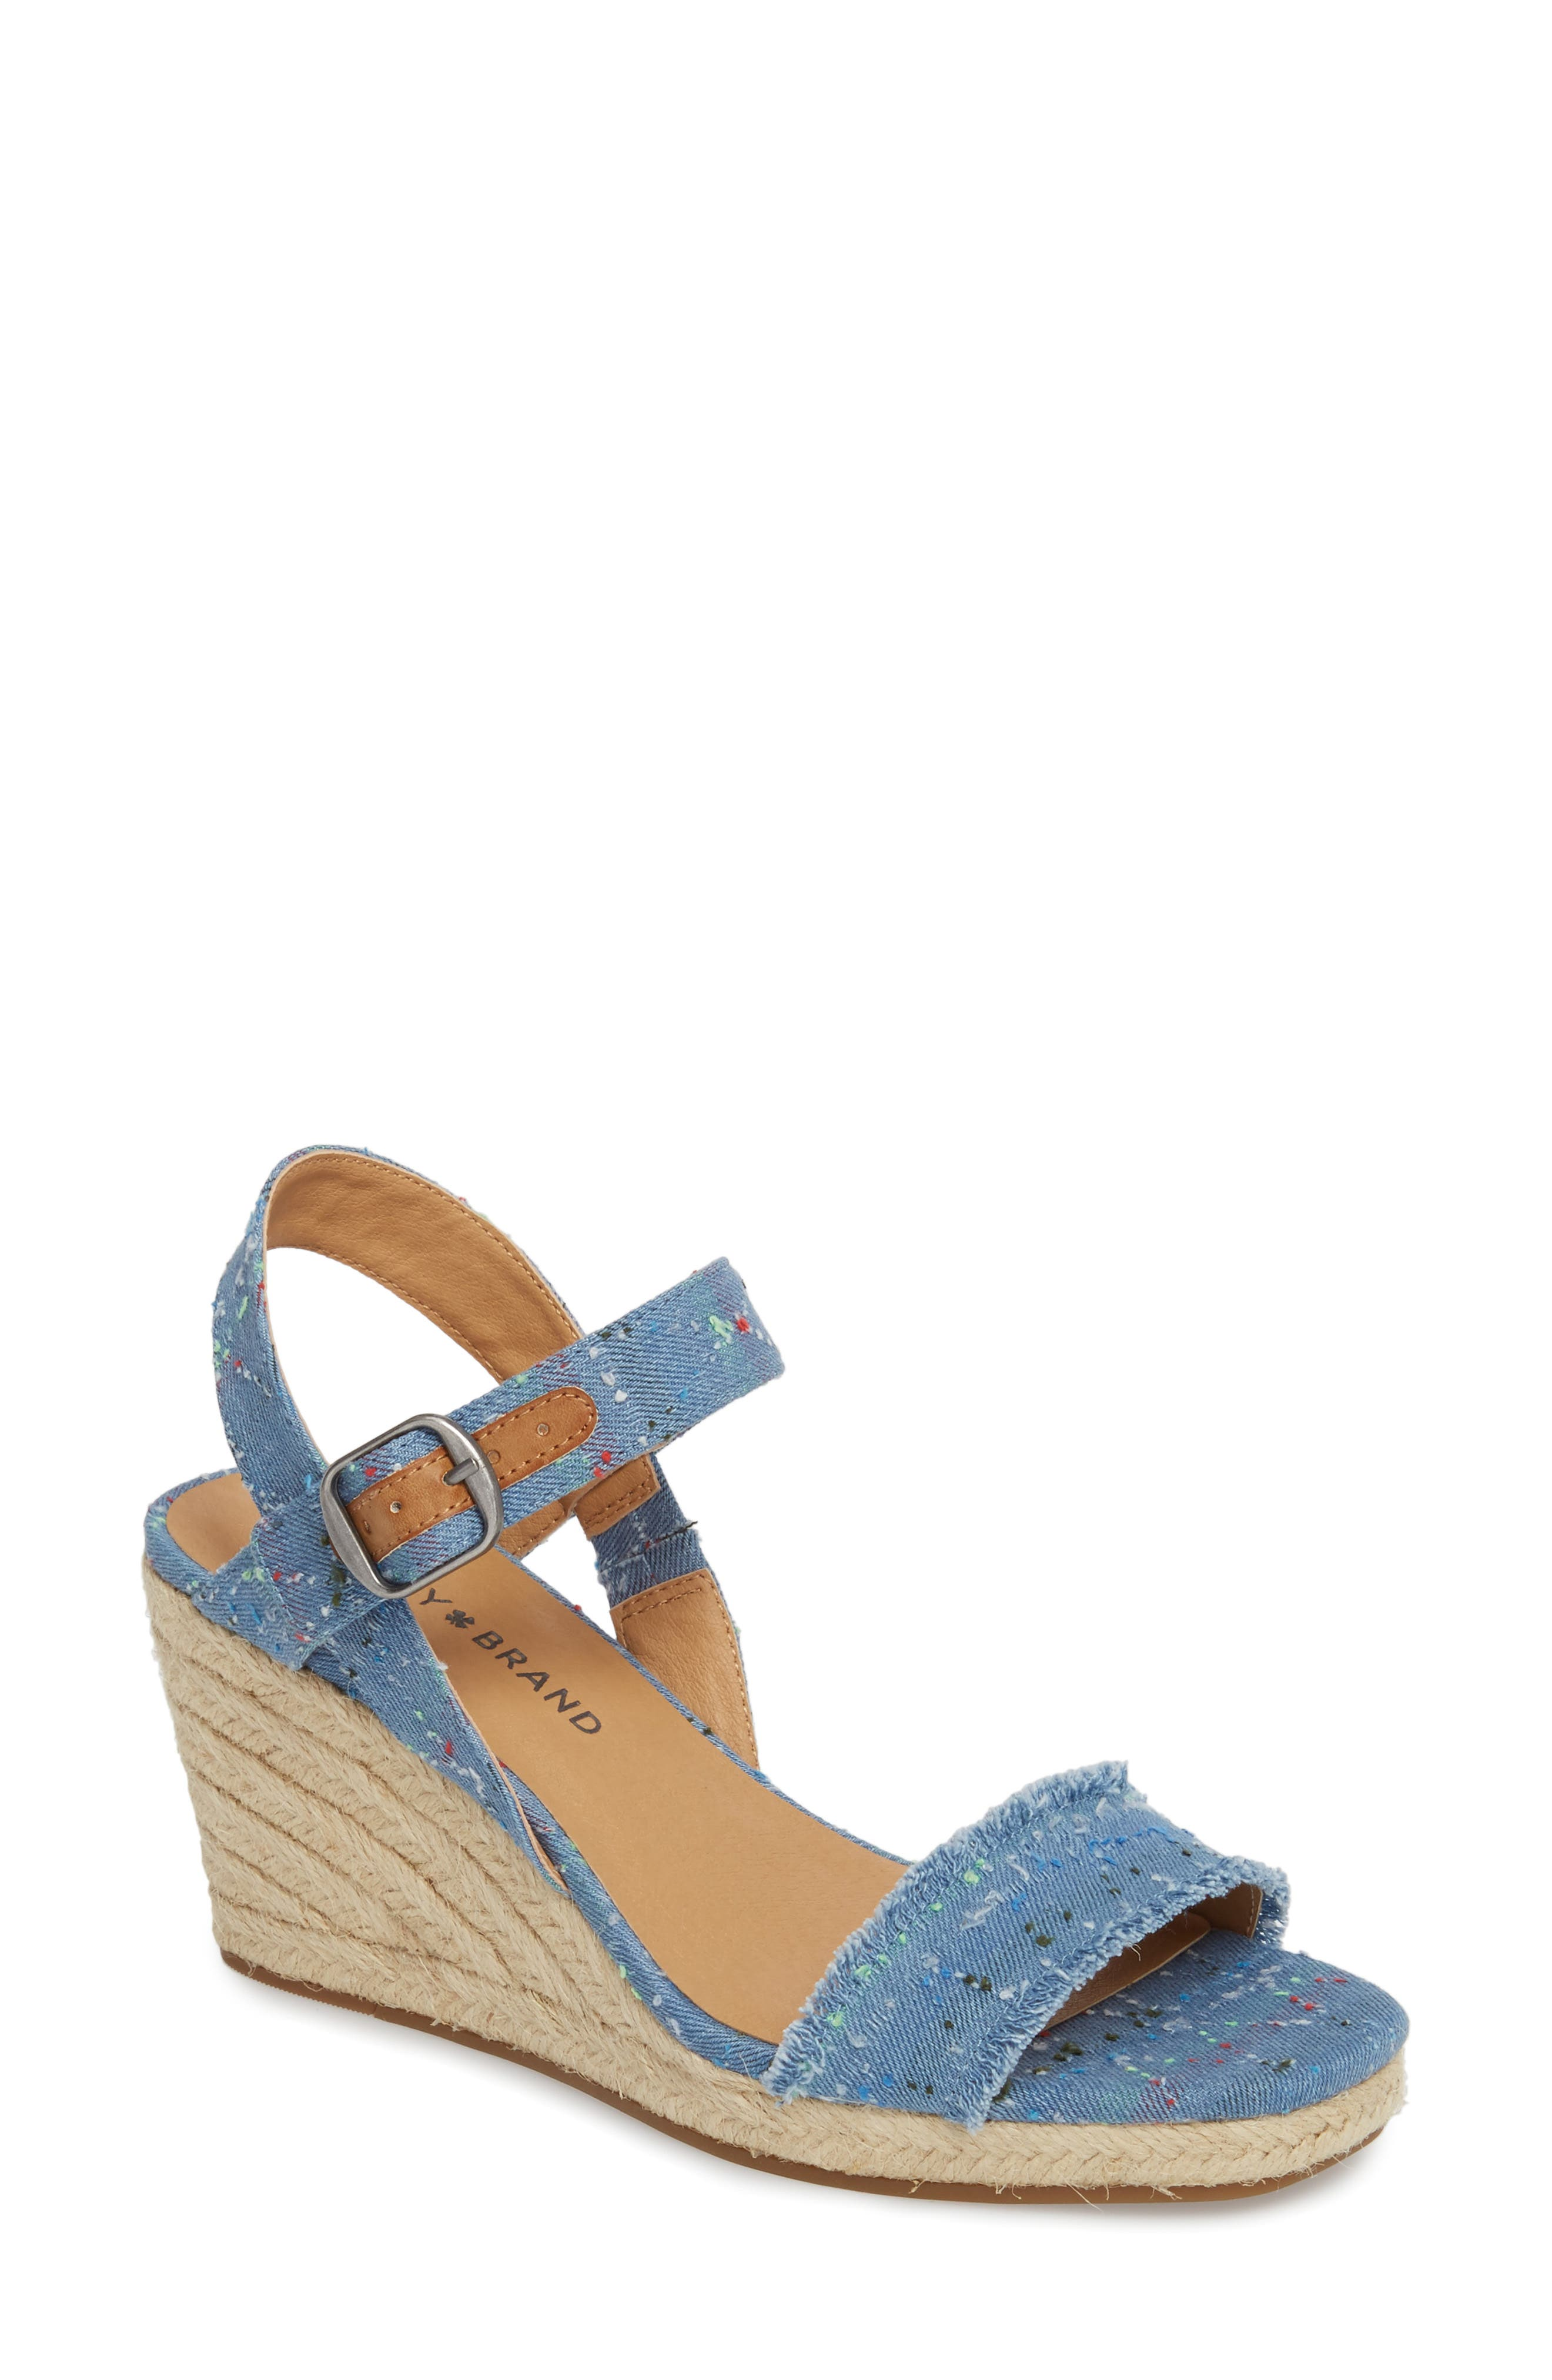 Marceline Squared Toe Wedge Sandal,                             Main thumbnail 5, color,